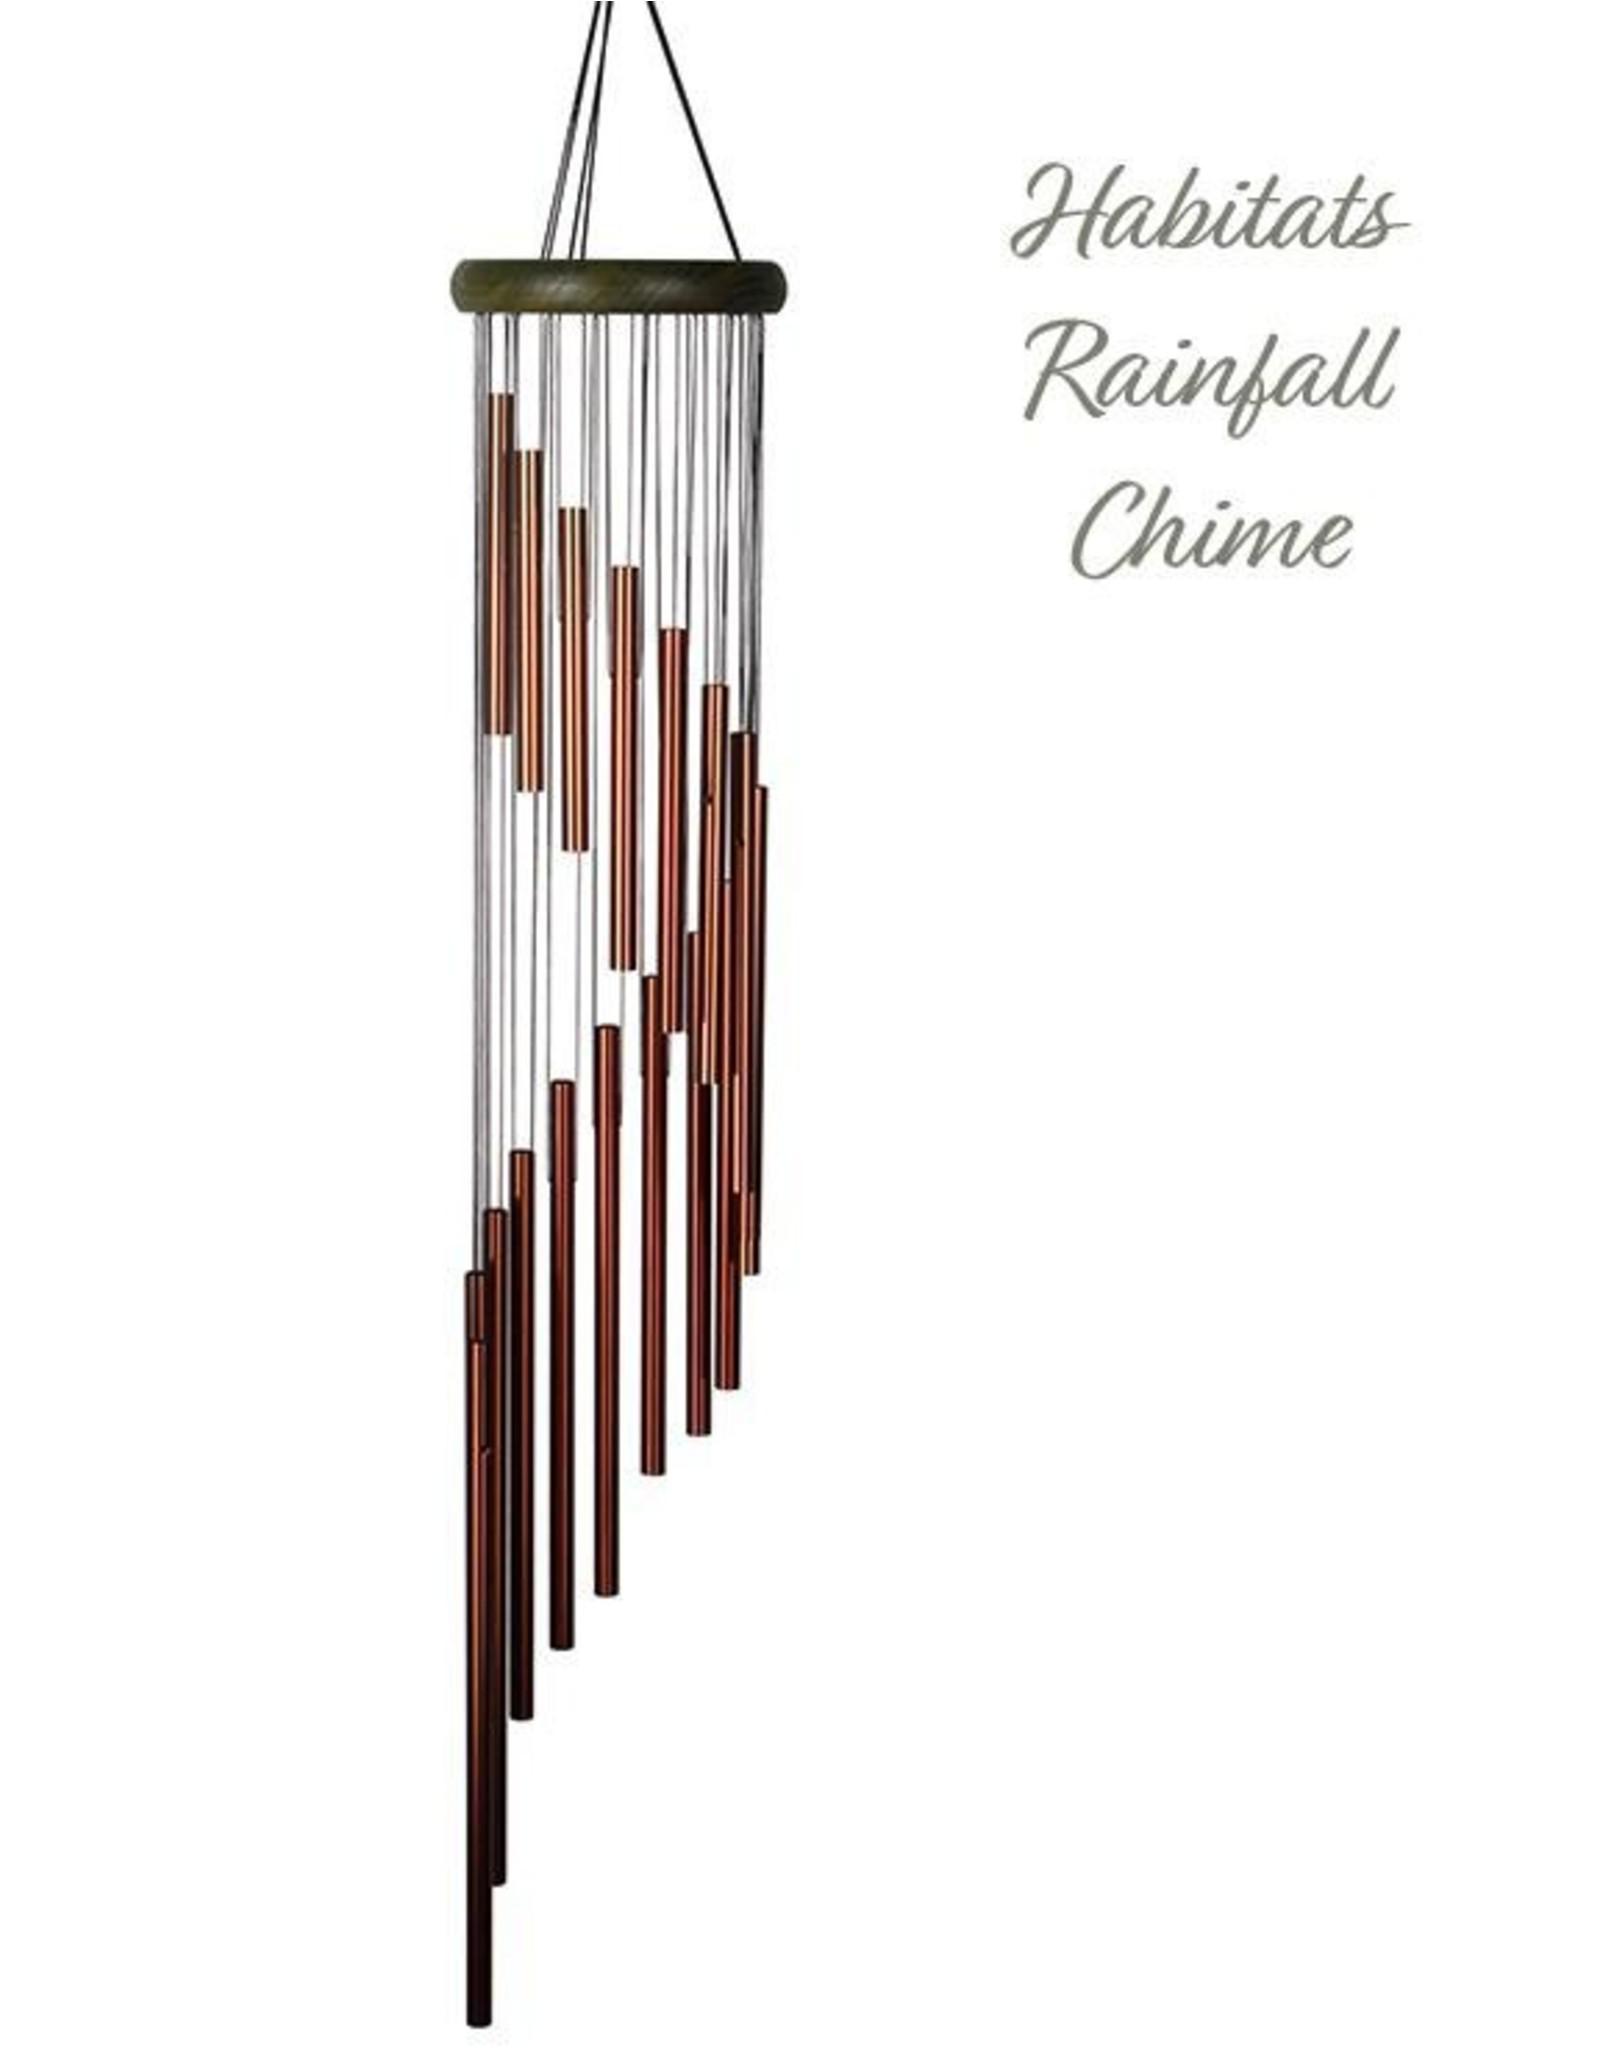 Woodstock Percussion Habitats Rainfall Chime